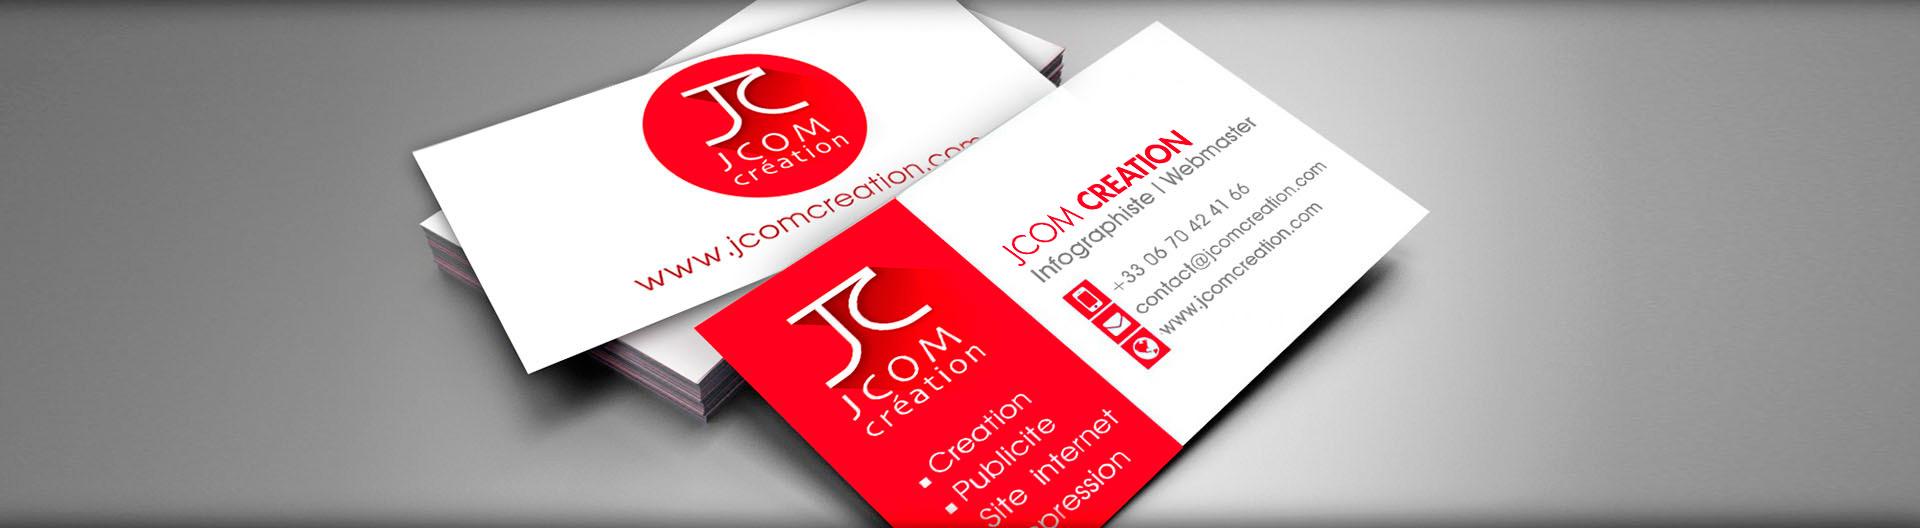 contact jcomcreation